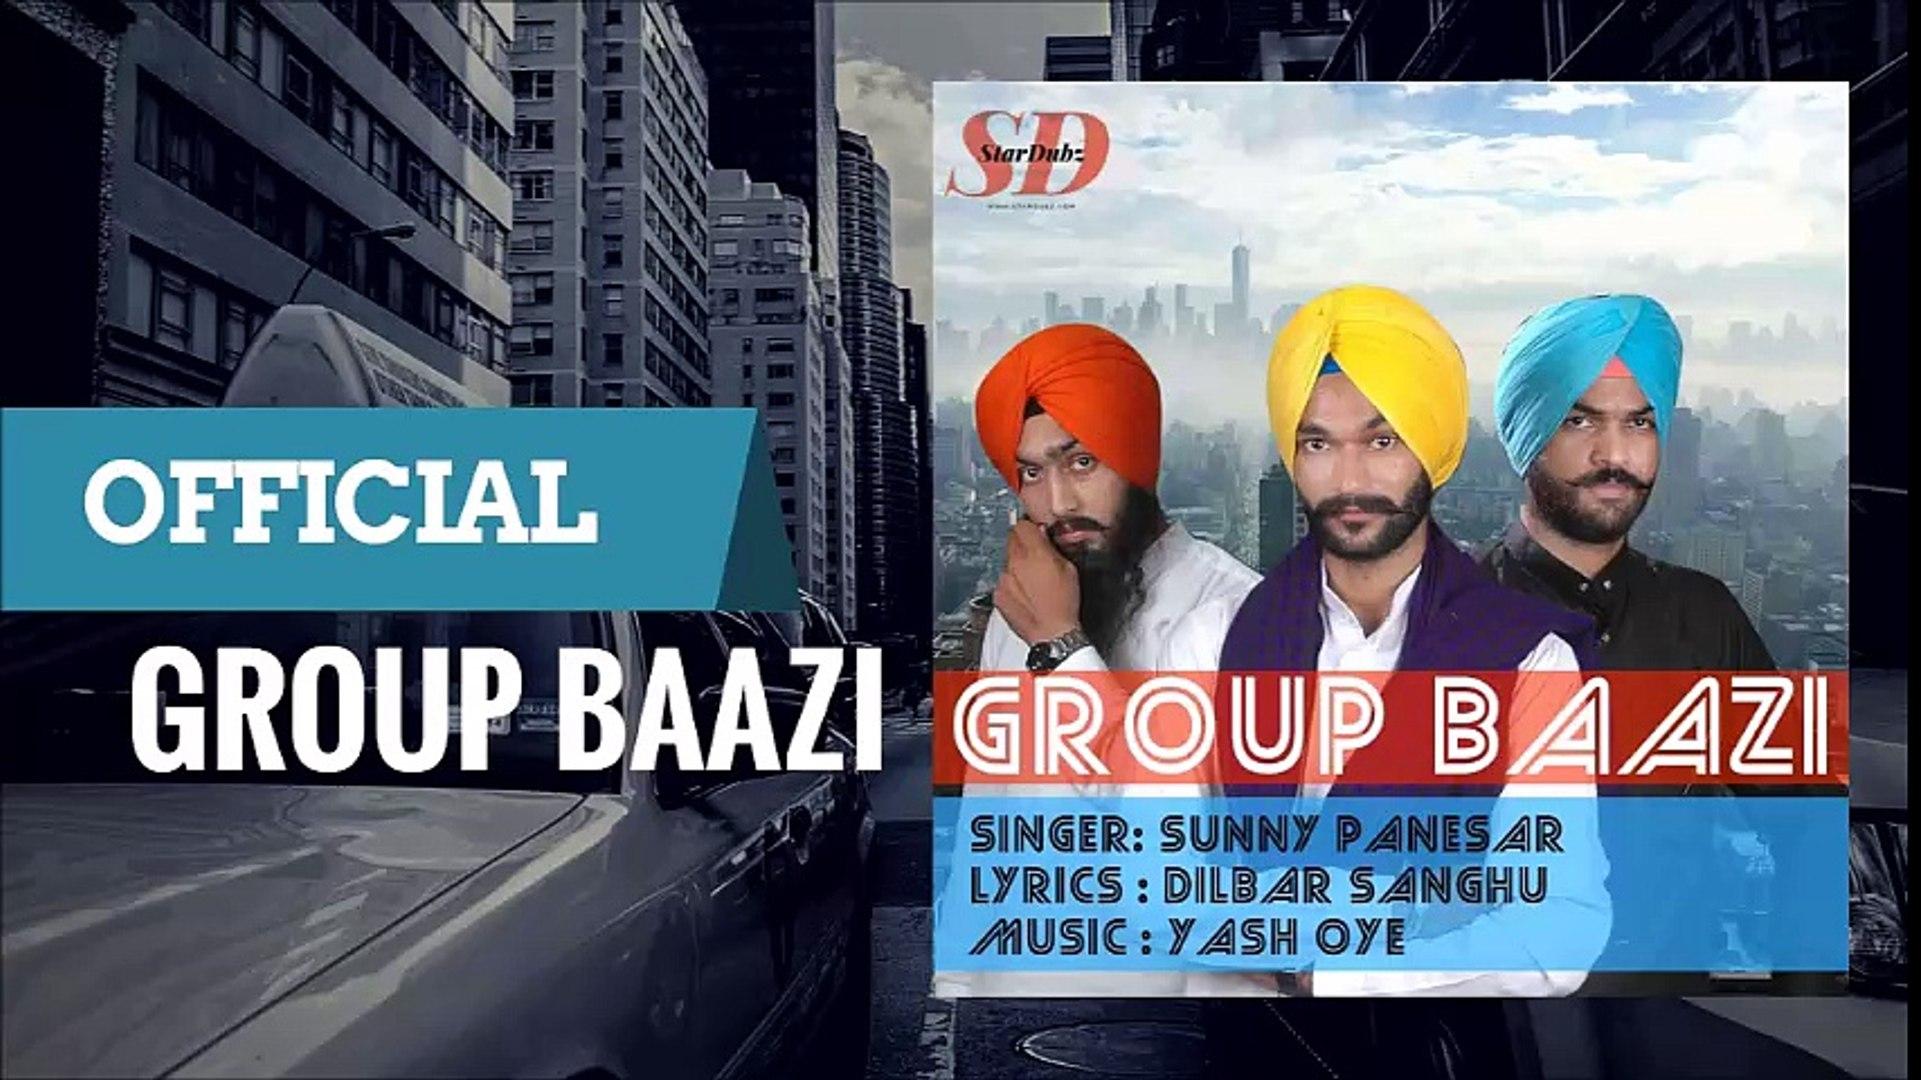 Download | Group Baazi | Sunny Panesar | Dilbar Sanghu | Yash Oye | Free Mp3 Download